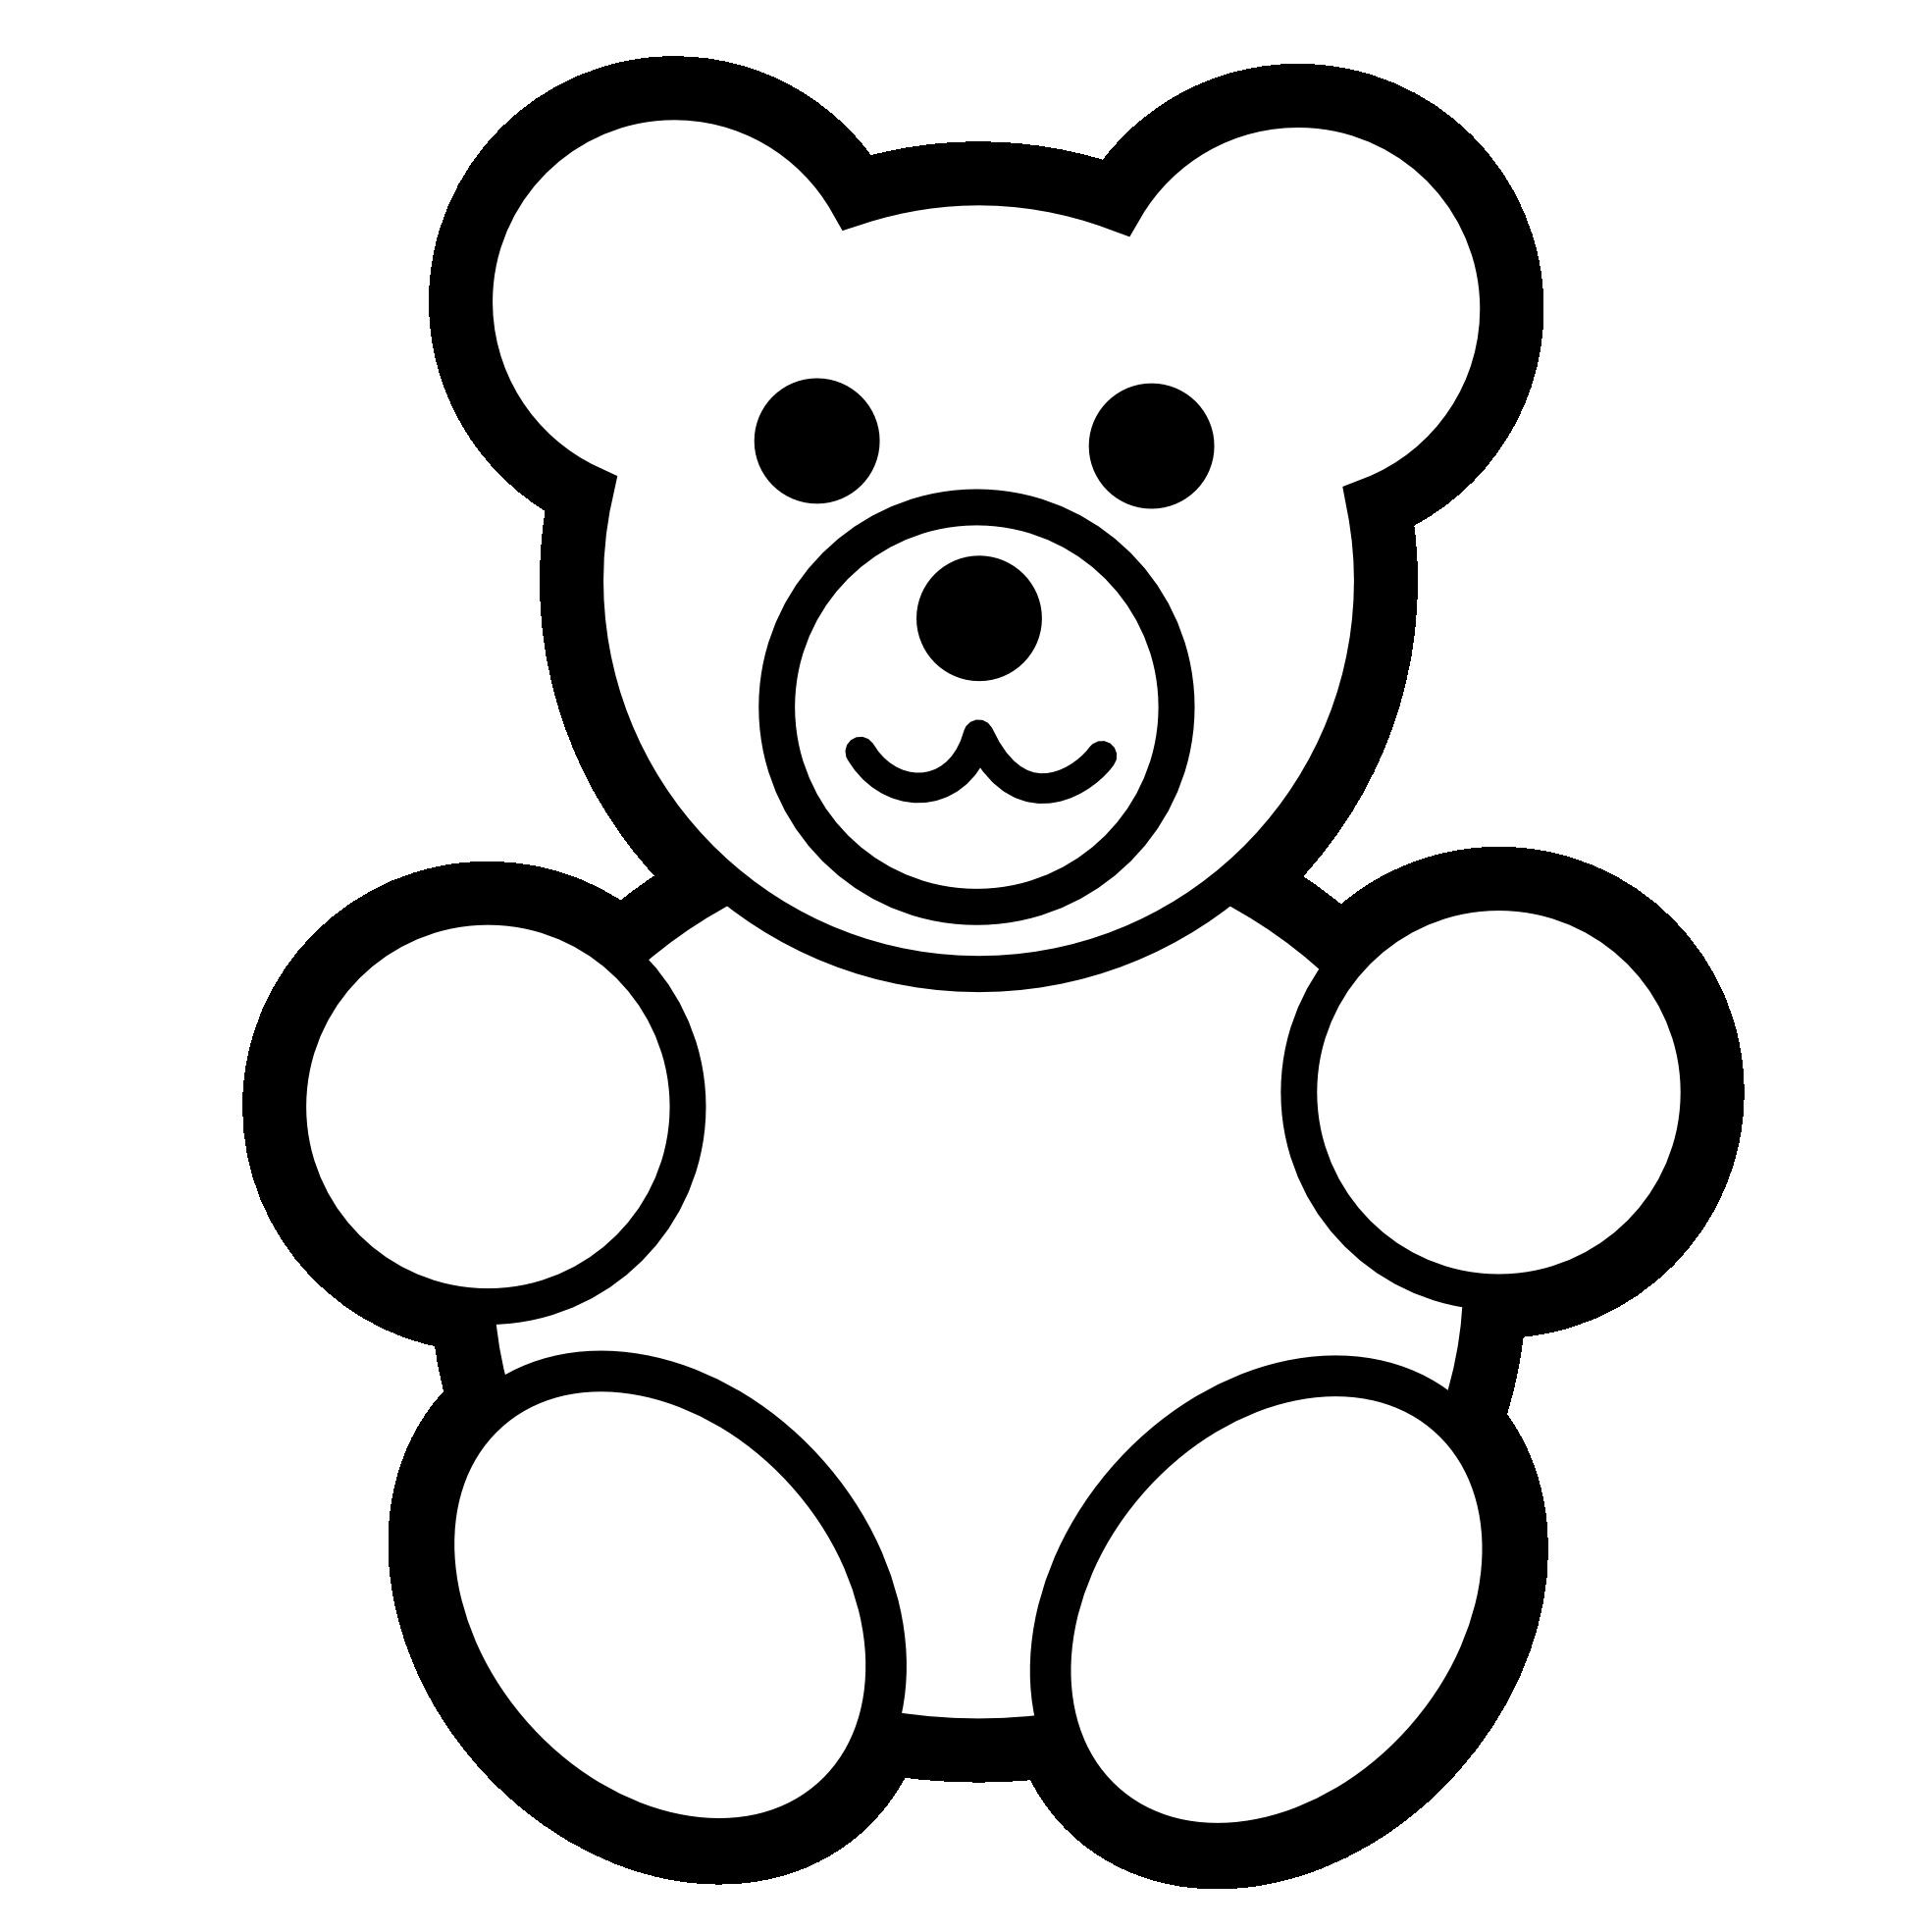 Pokemon clipart black and white. Teddy bear panda free